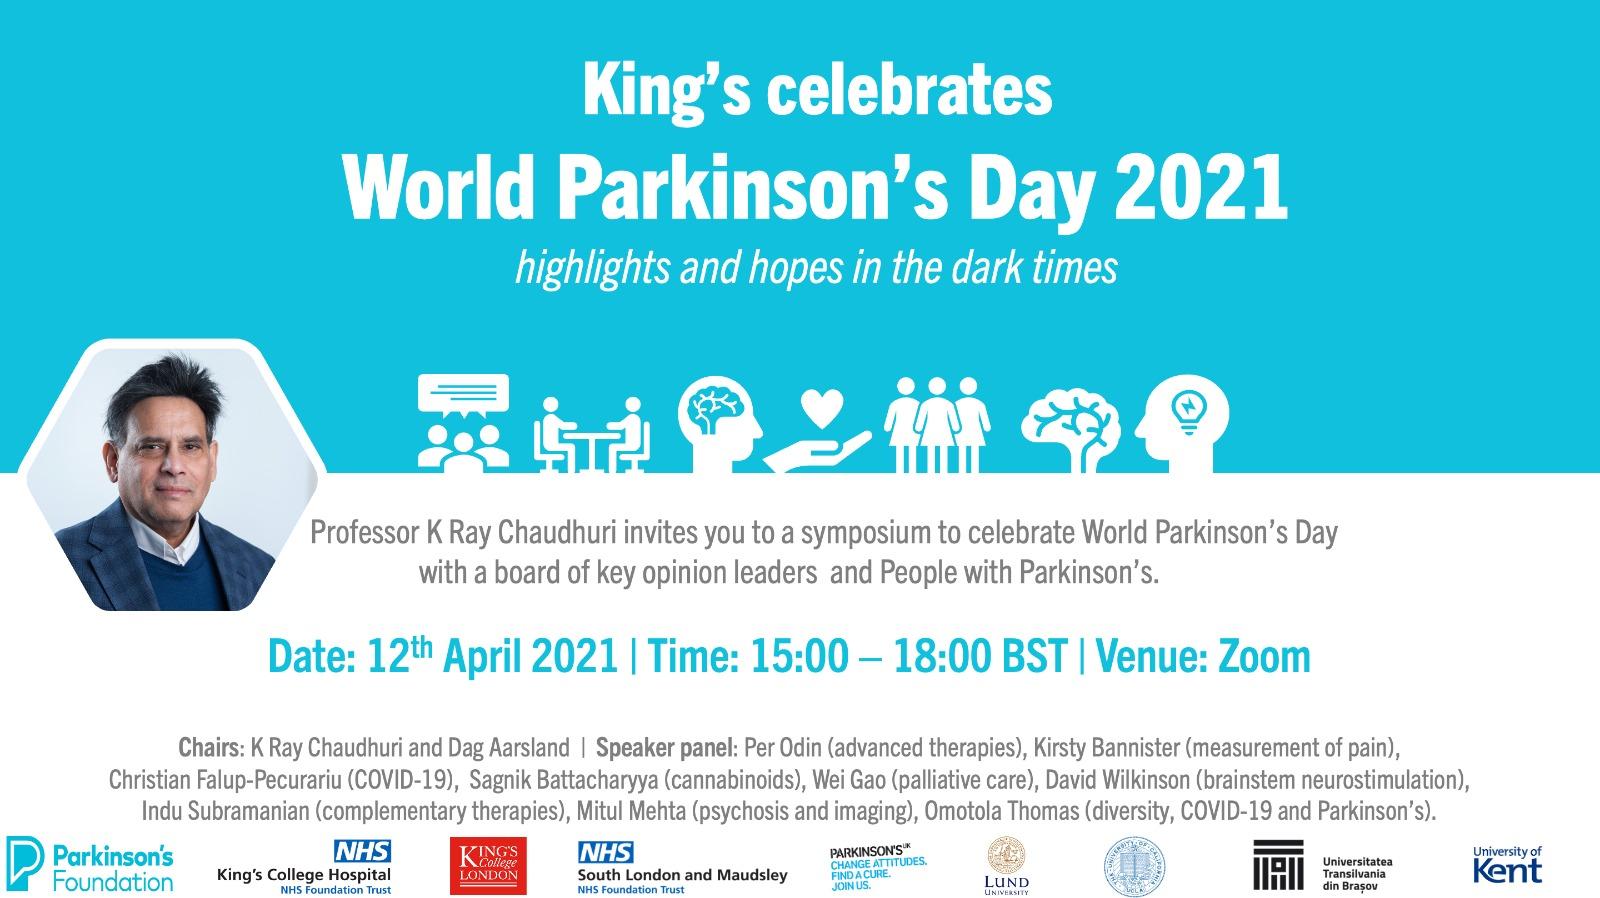 World Parkinson's Day 2021 Symposium